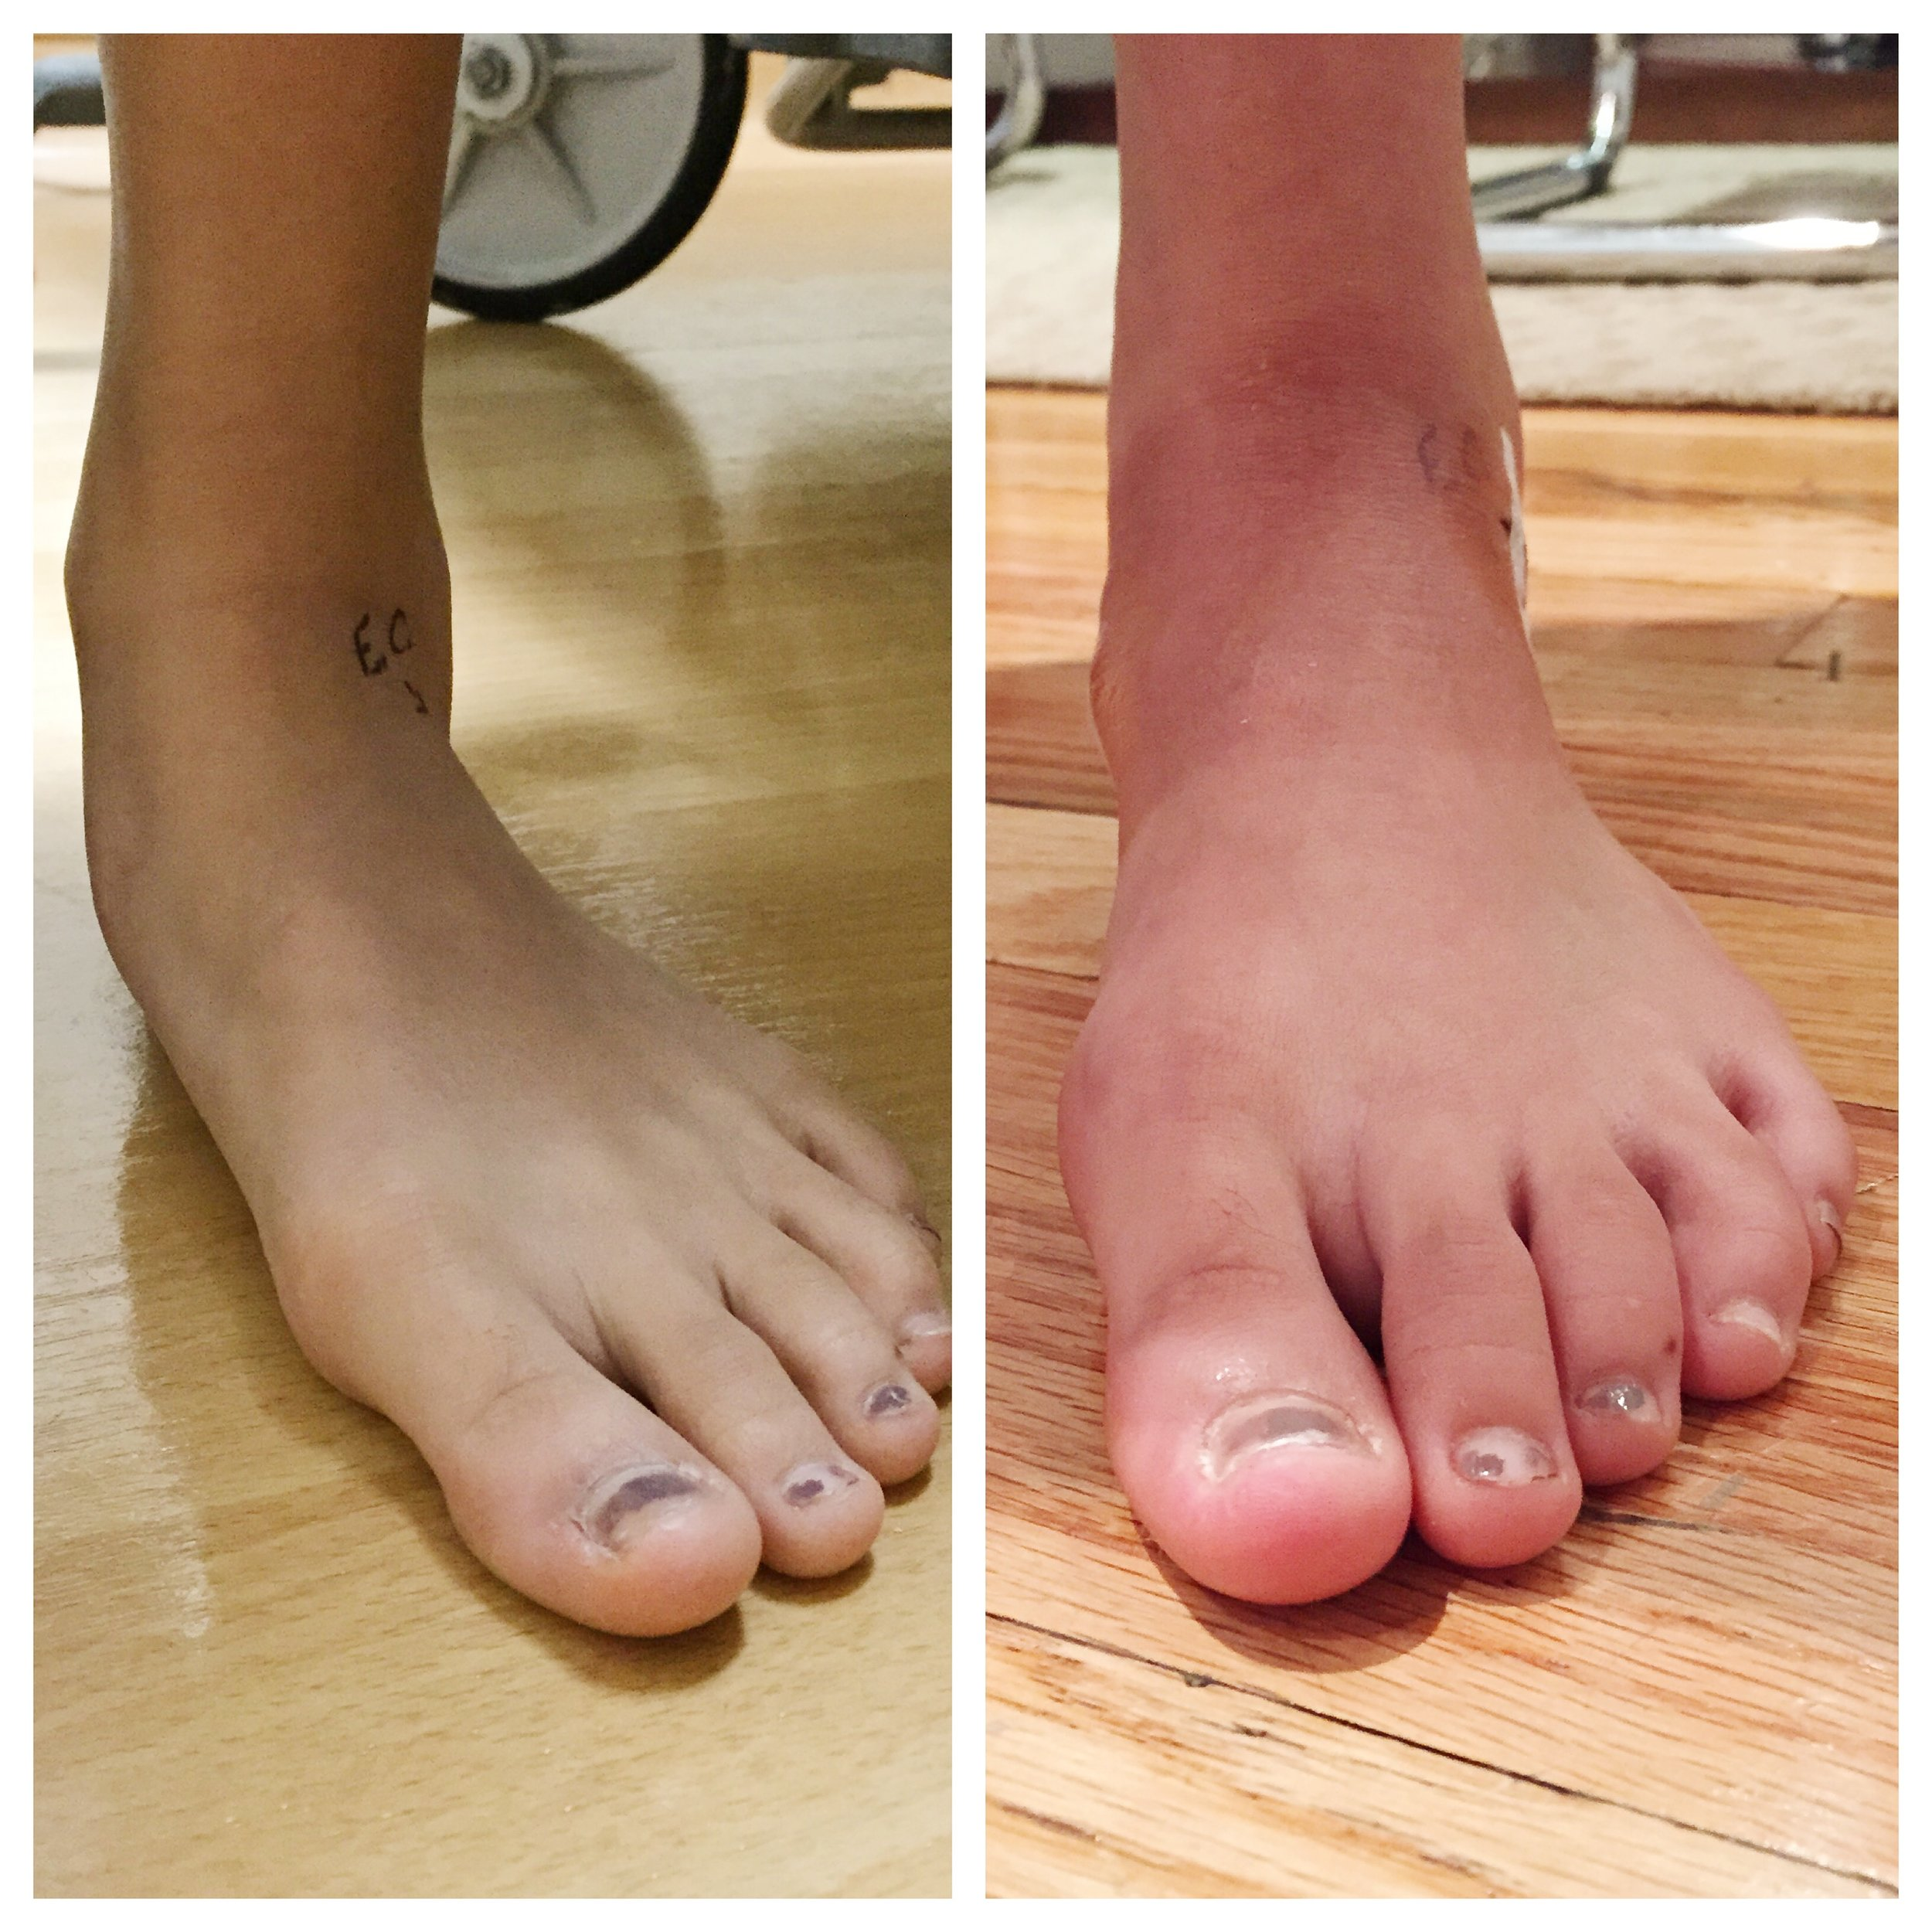 f27e69b9f9d6 Correcting a Flexible Pediatric Flat Foot to Avoid Adult Bunions ...